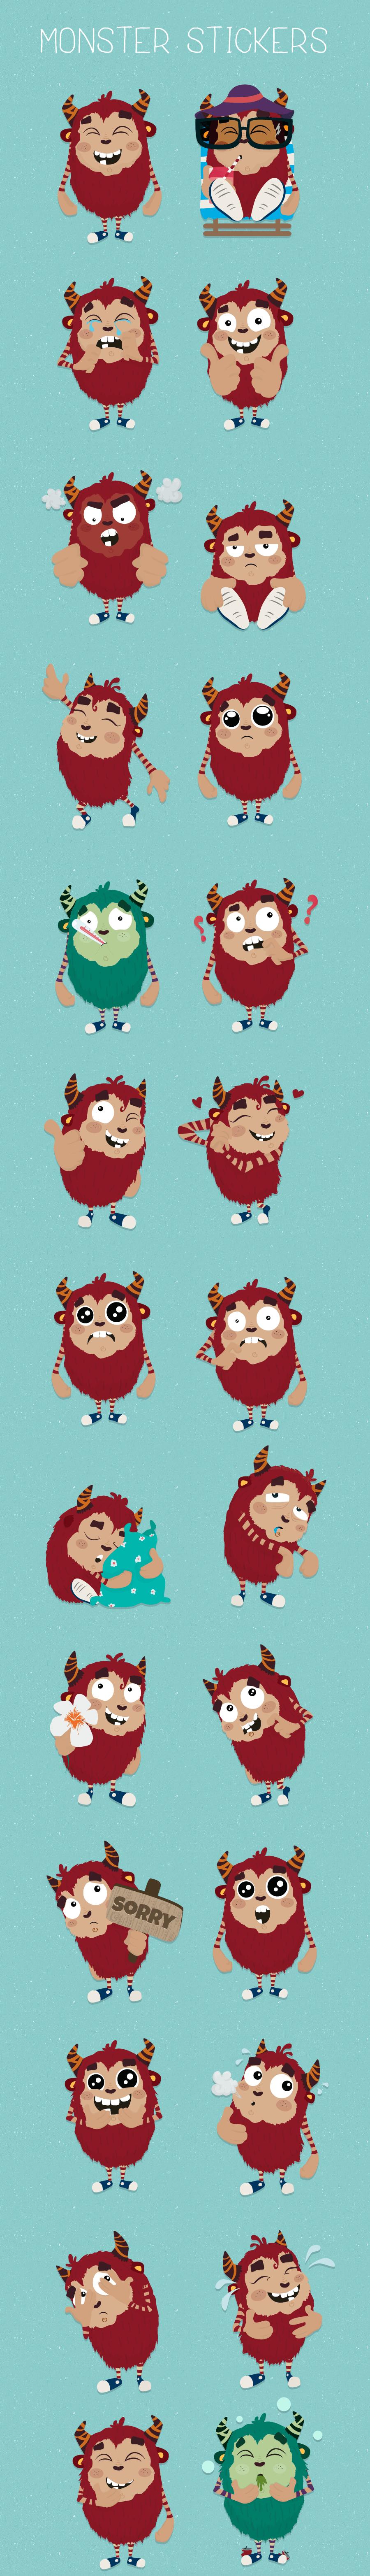 Monsters emotions facebook messenger stickers